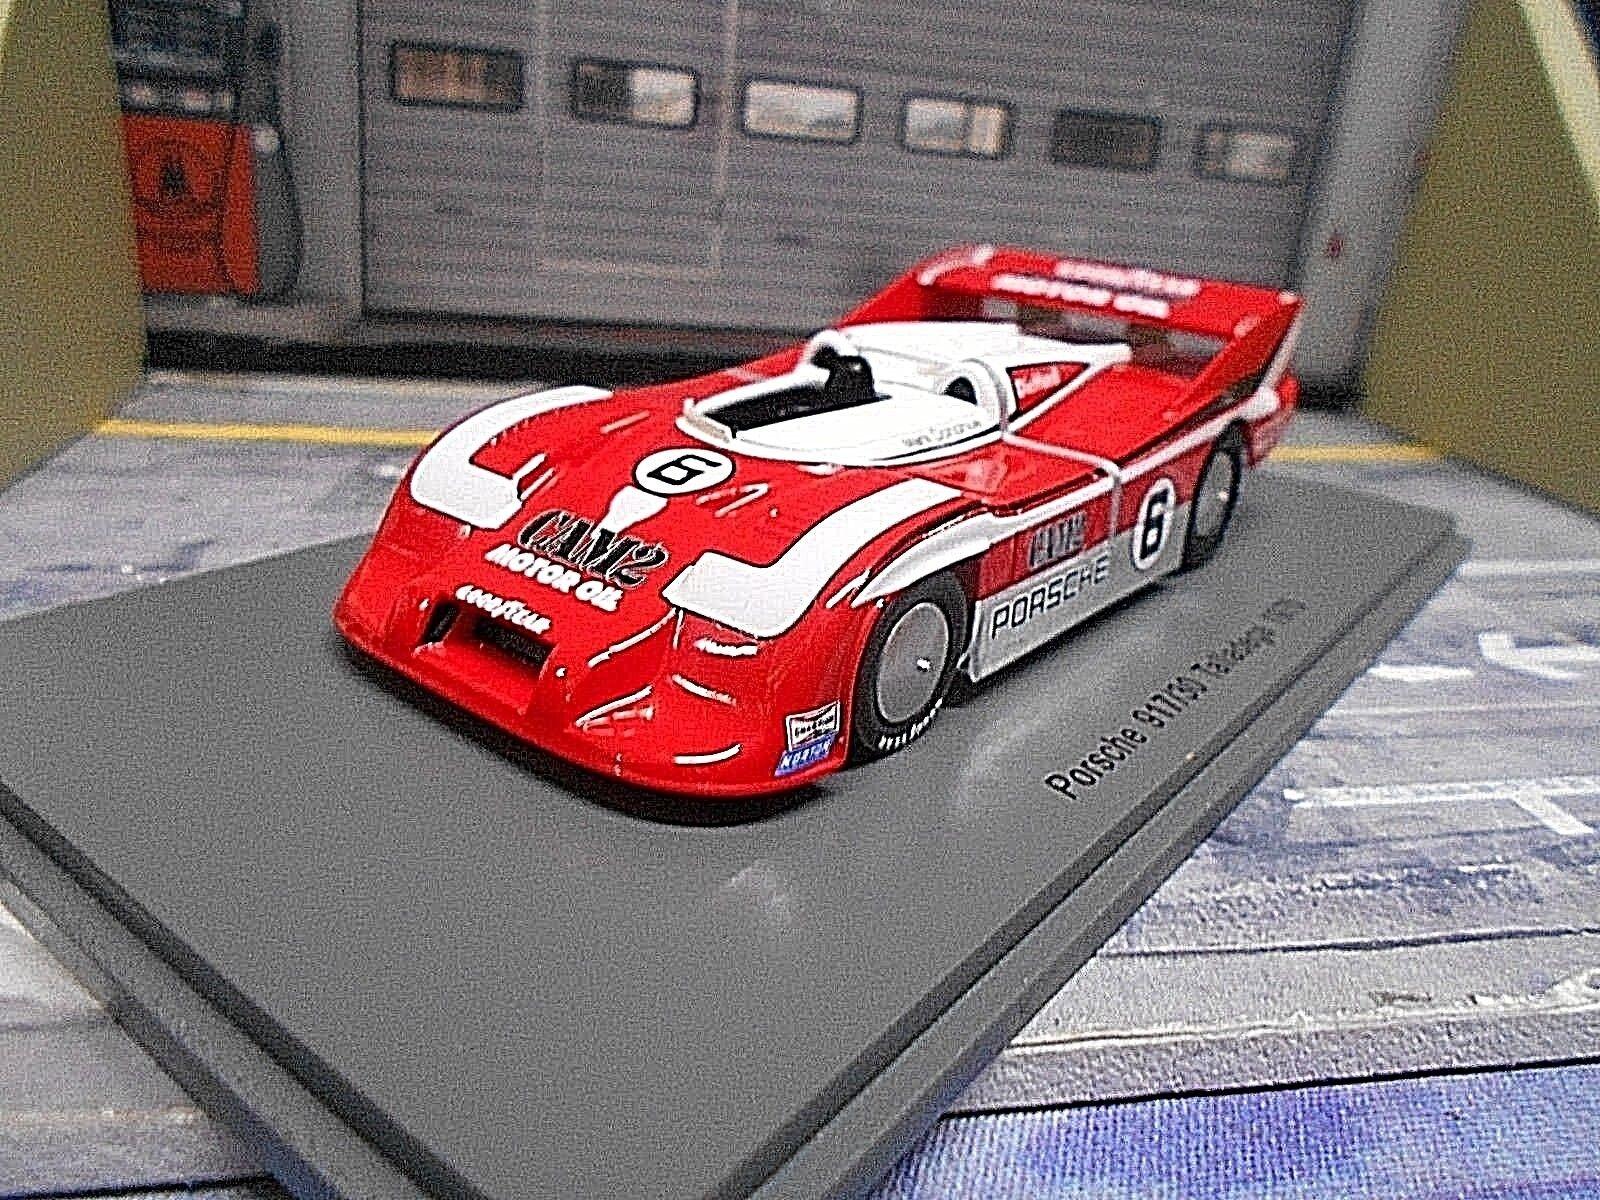 PORSCHE 917 30 917  30 CanAm sizedega World Speed Record Donohue 75 Spark 1 43